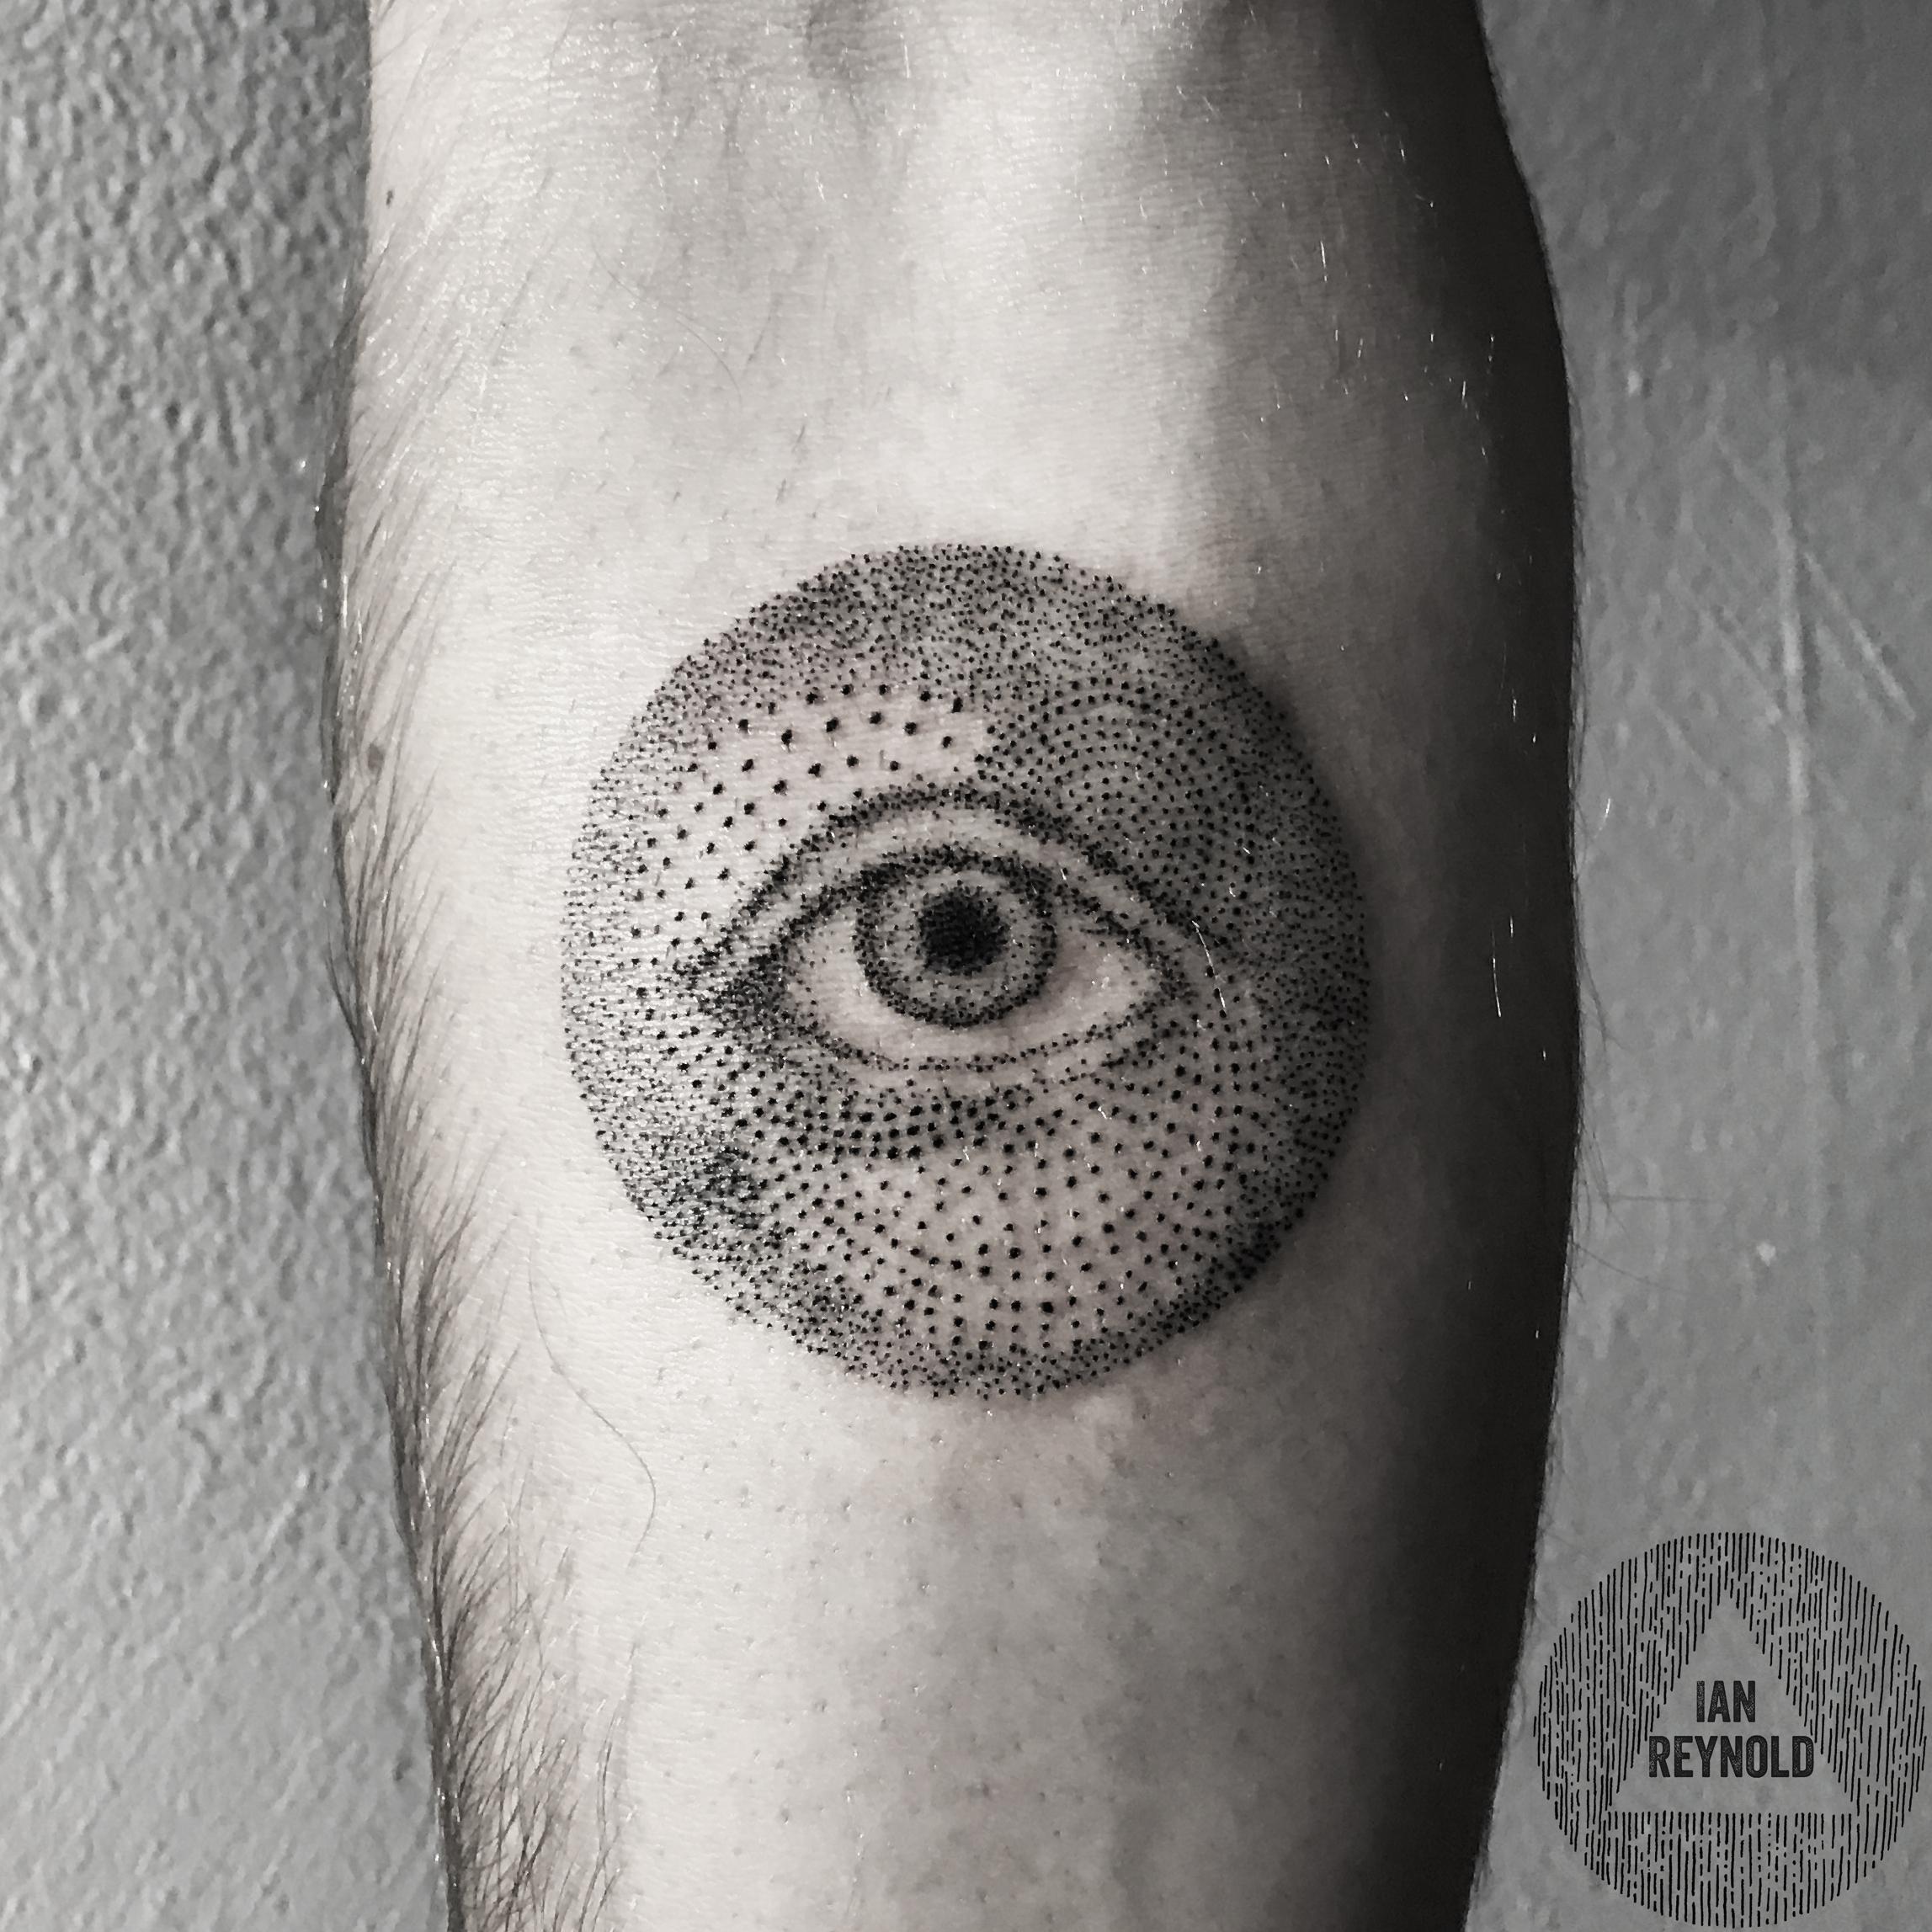 Pointillisim eye